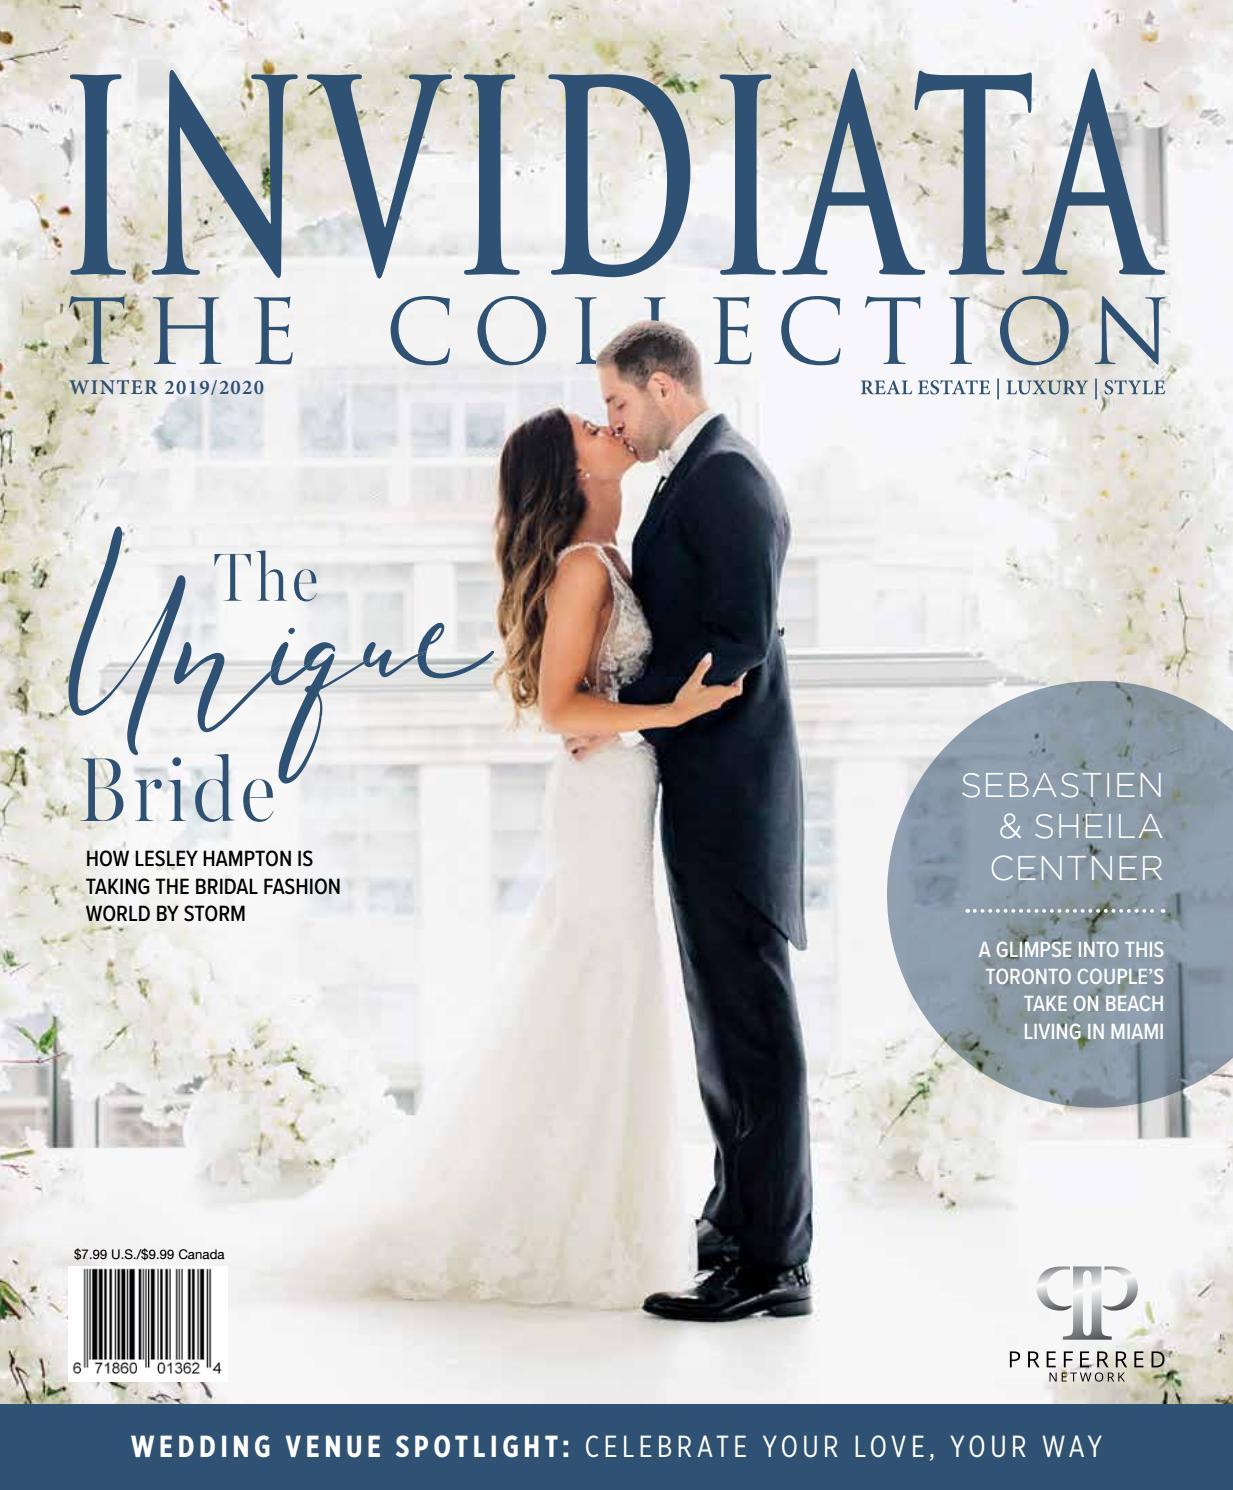 Betere The Invidiata Collection Winter 2019/20 by Preferred Publishing GM-35